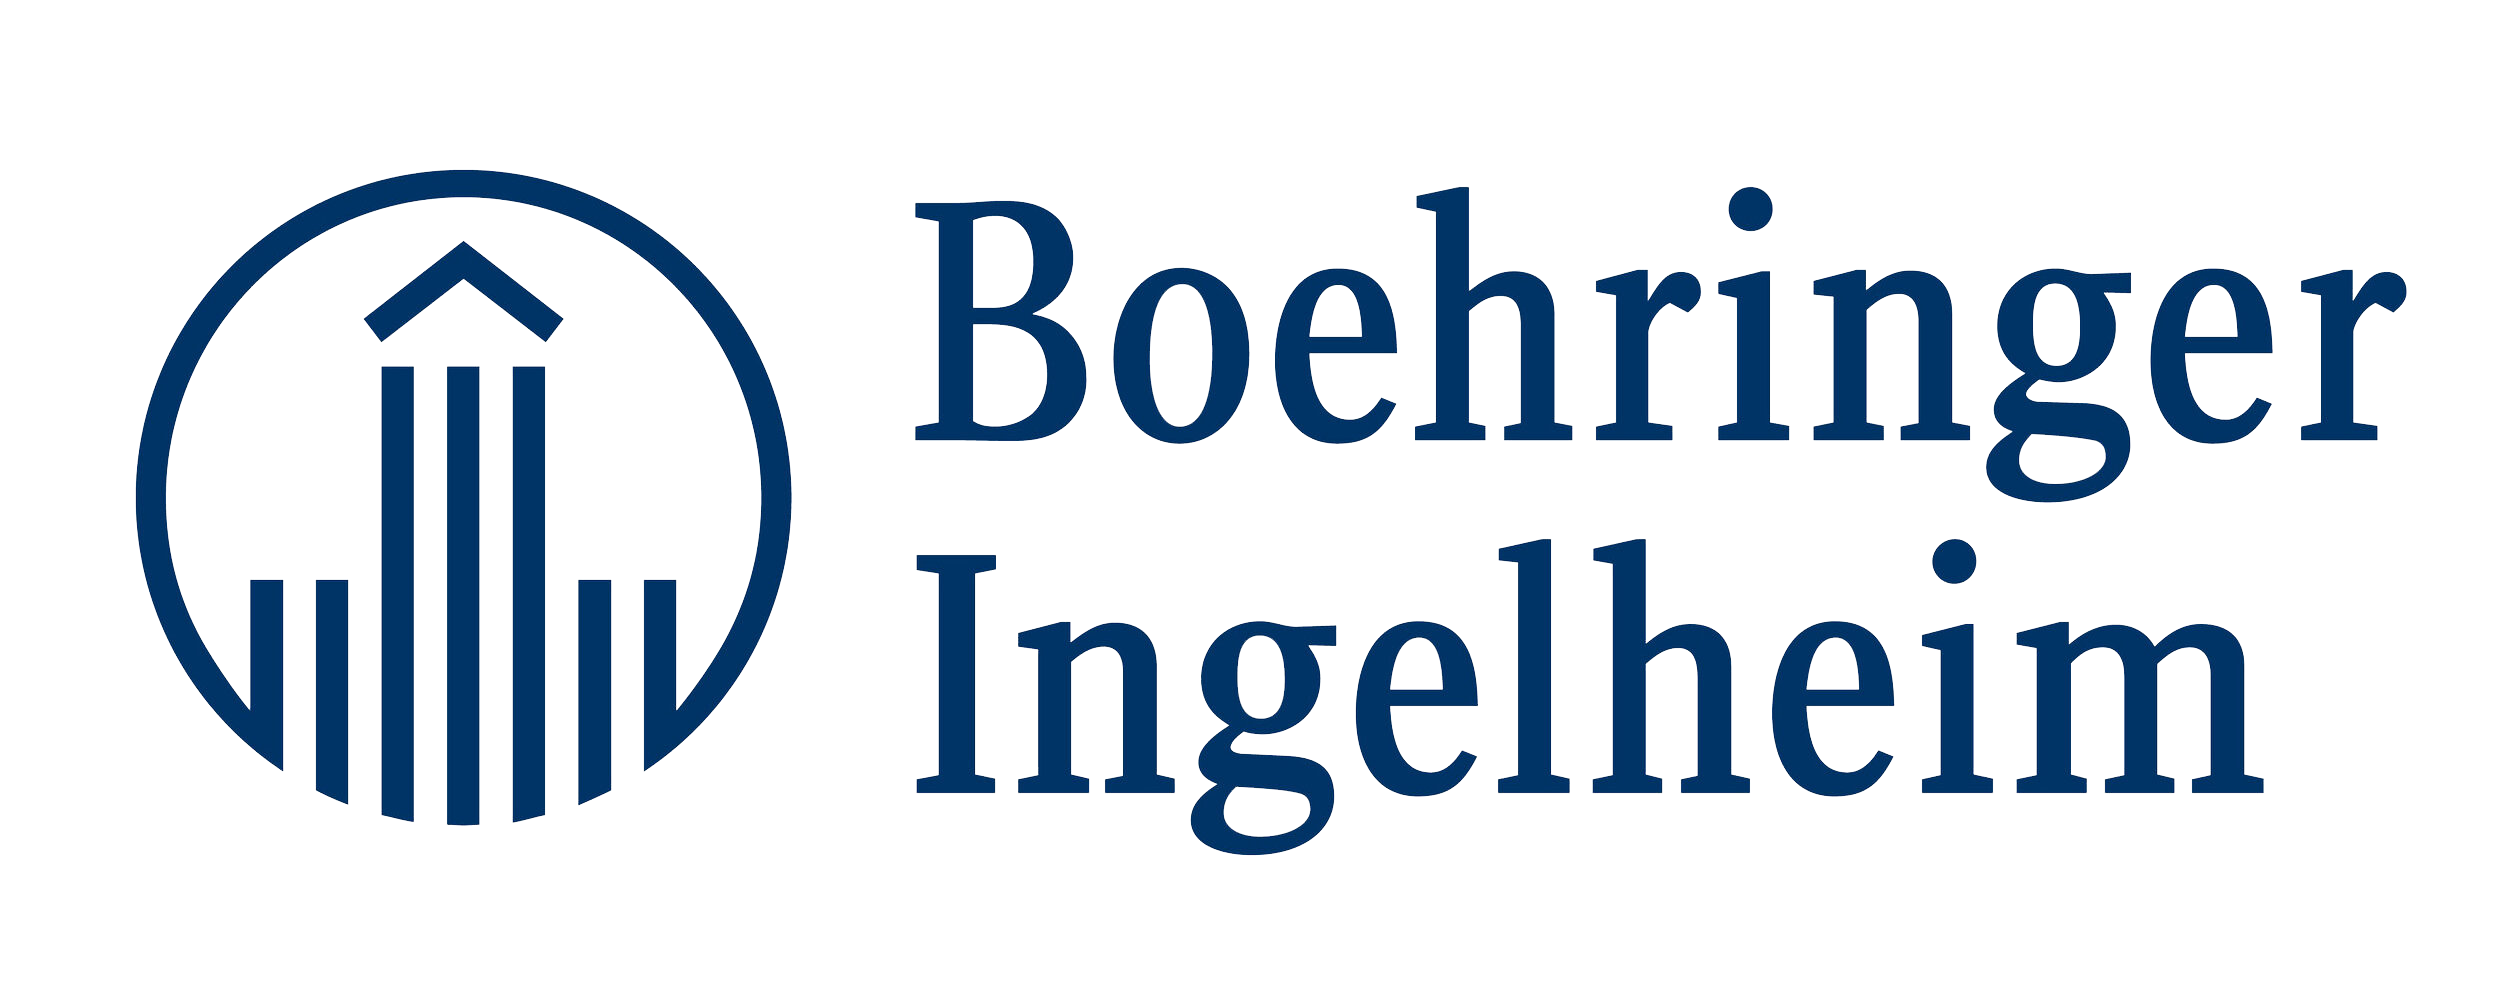 Boehringer-Ingelheim Pharmaceuticals Logo